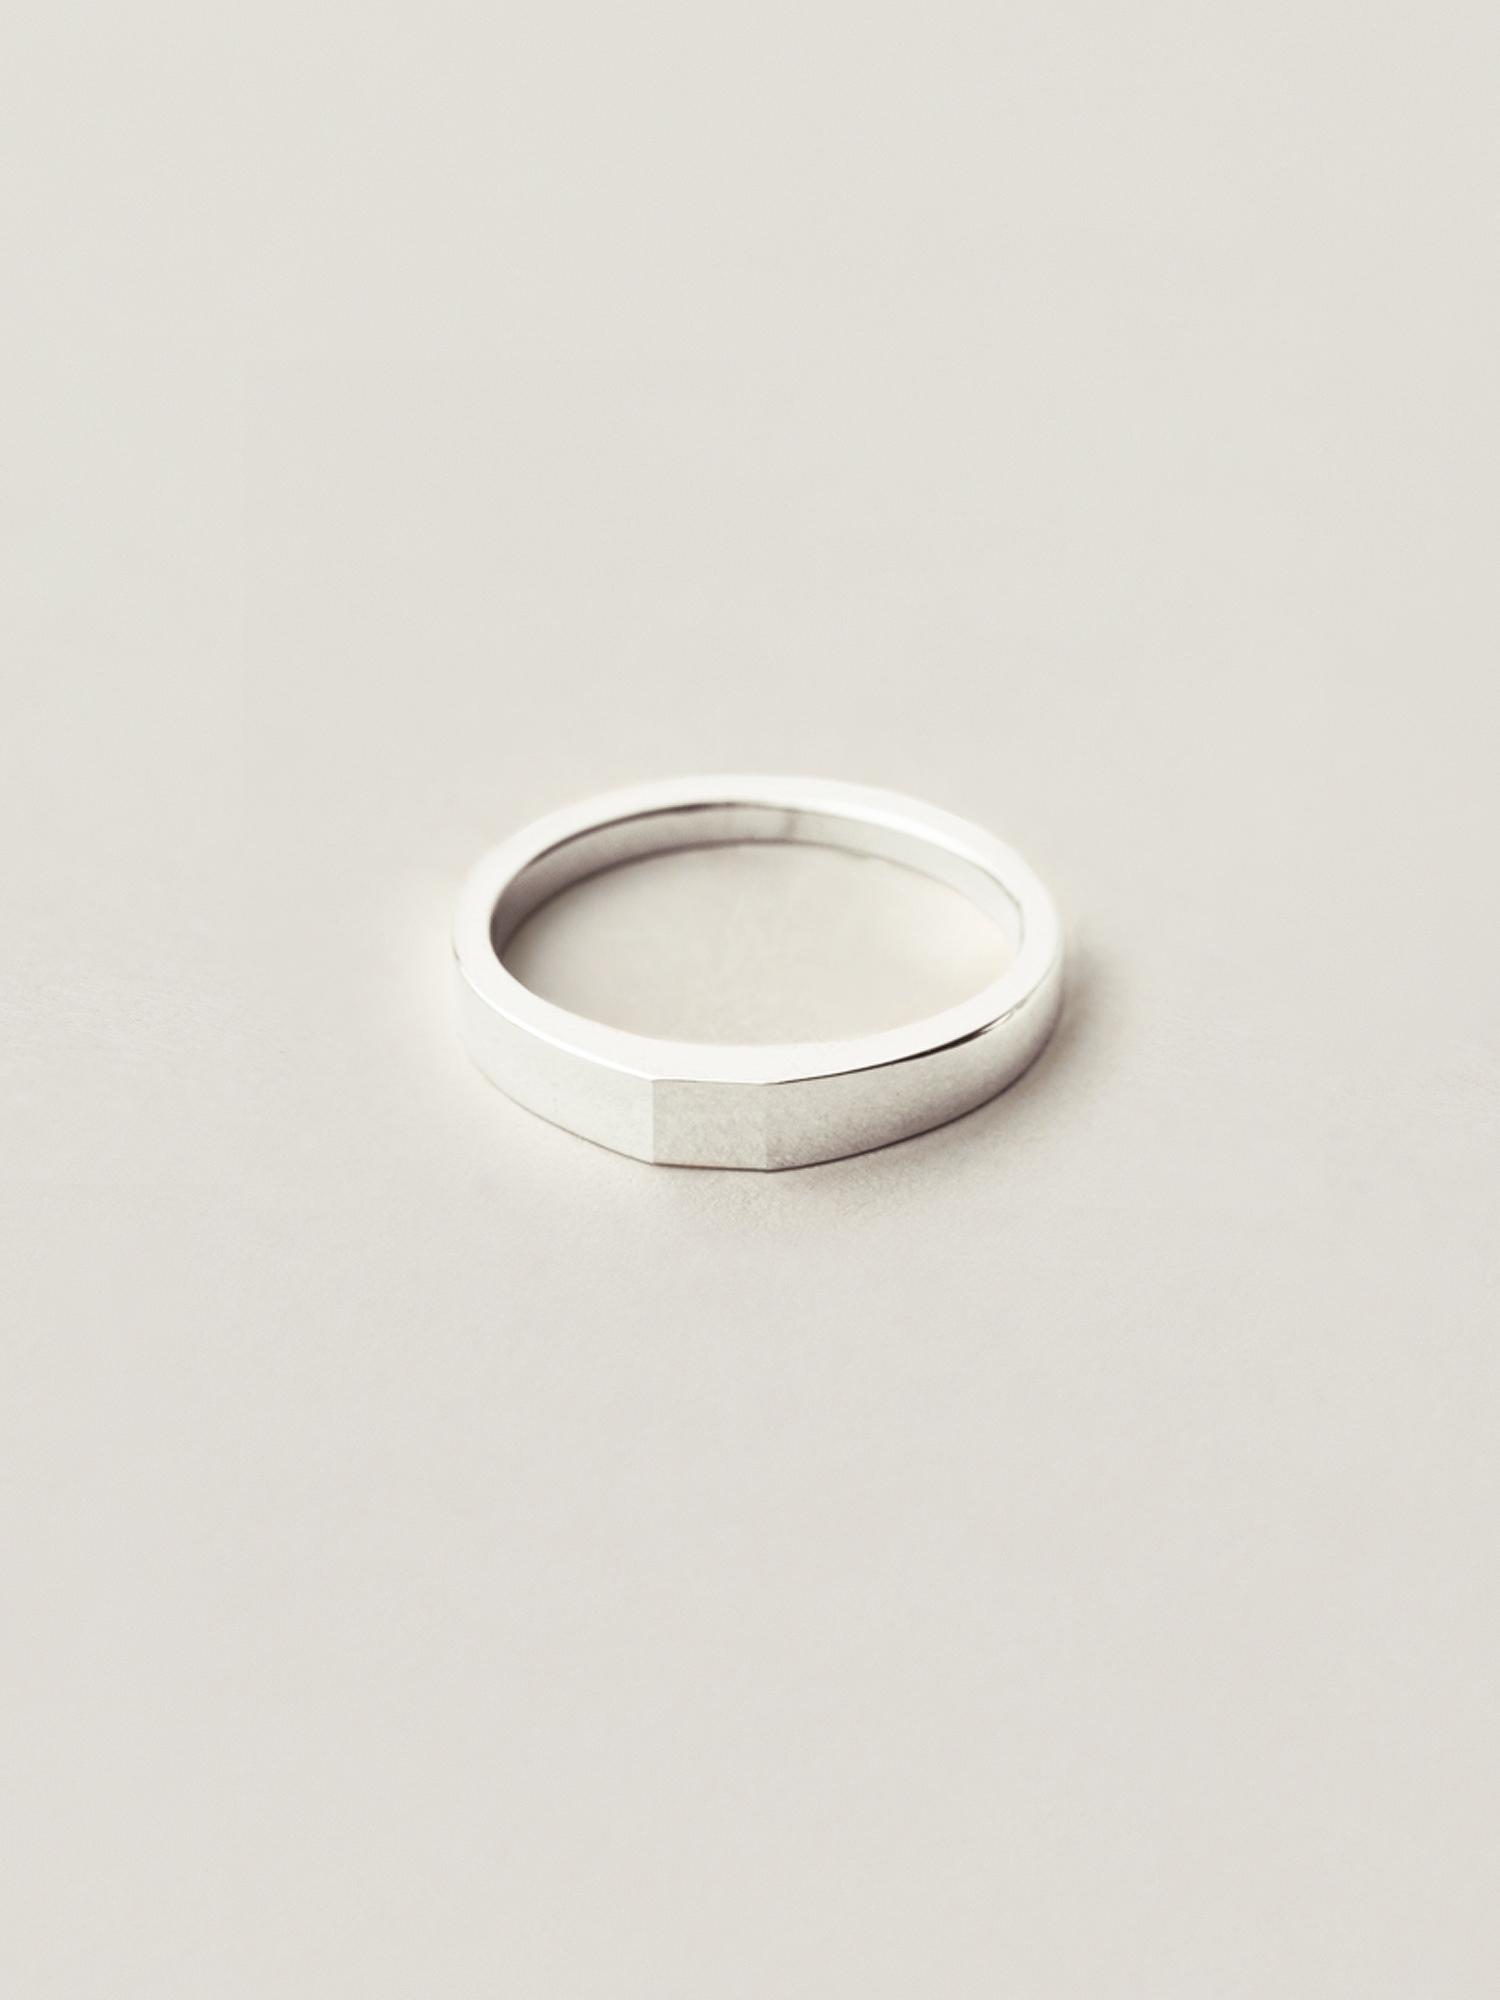 Verlobungsring-Silber-Quadrat-Christina-Pauls1.jpg